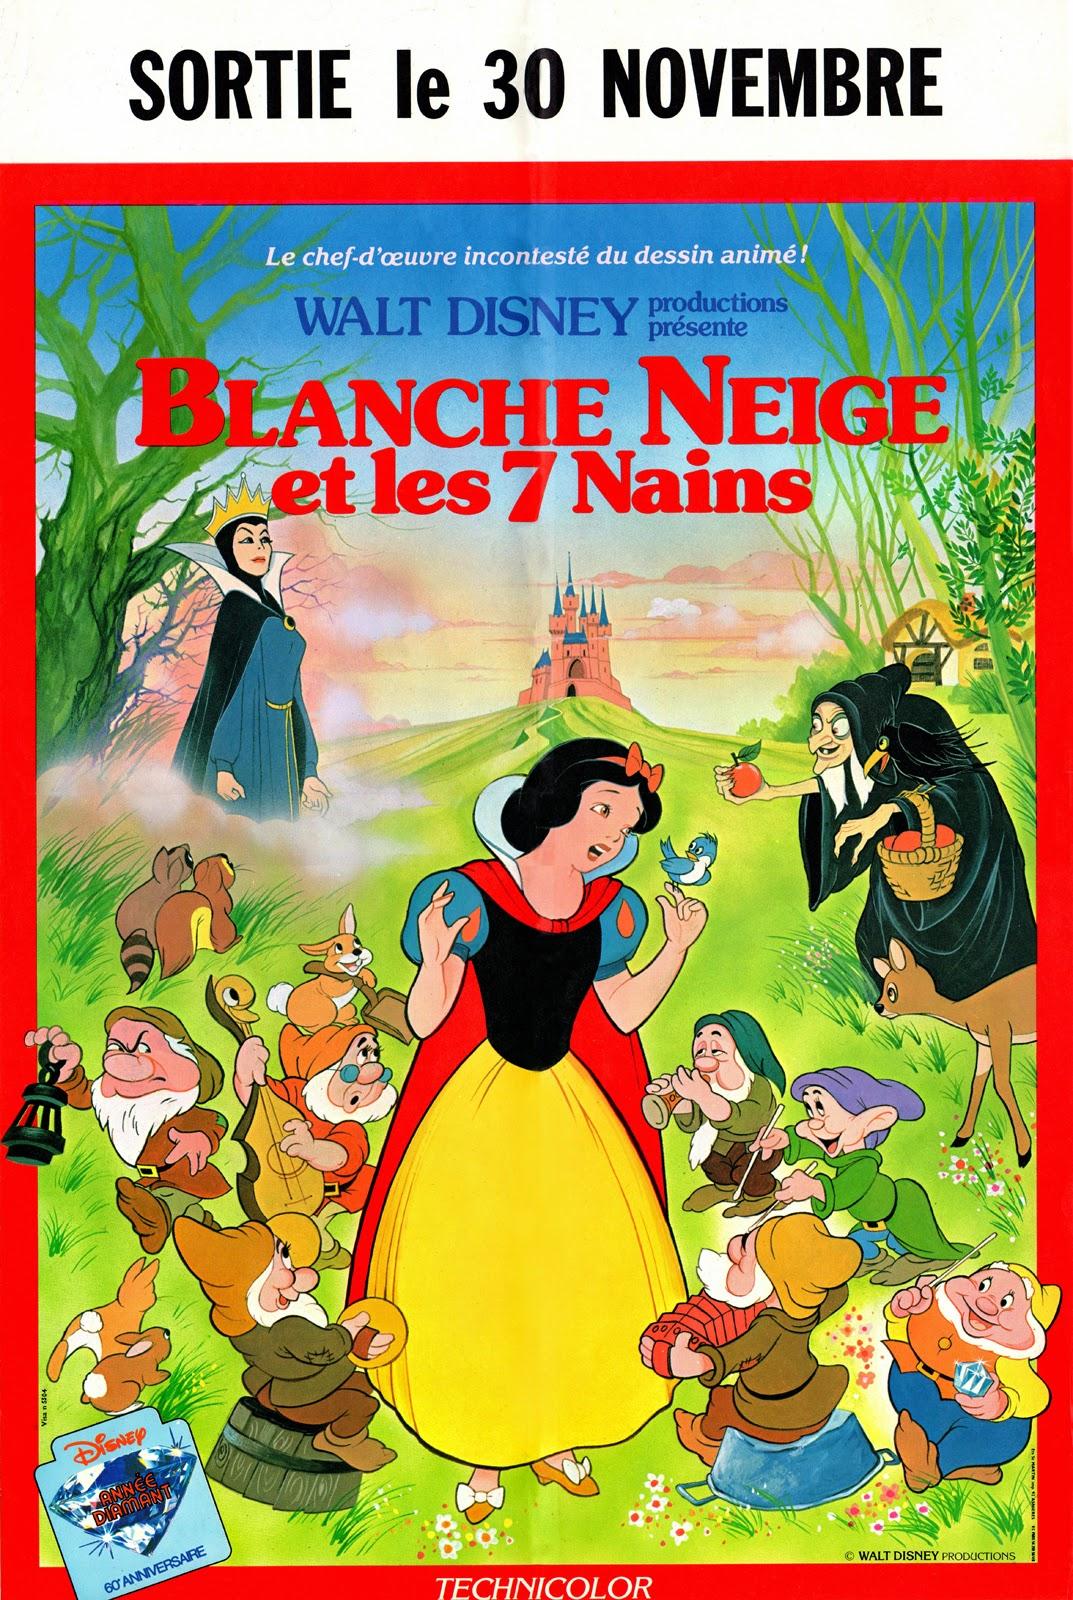 Robe fantaisie ~ DISNEY BLANCHE NEIGE 7 NAINS Sleepy masque